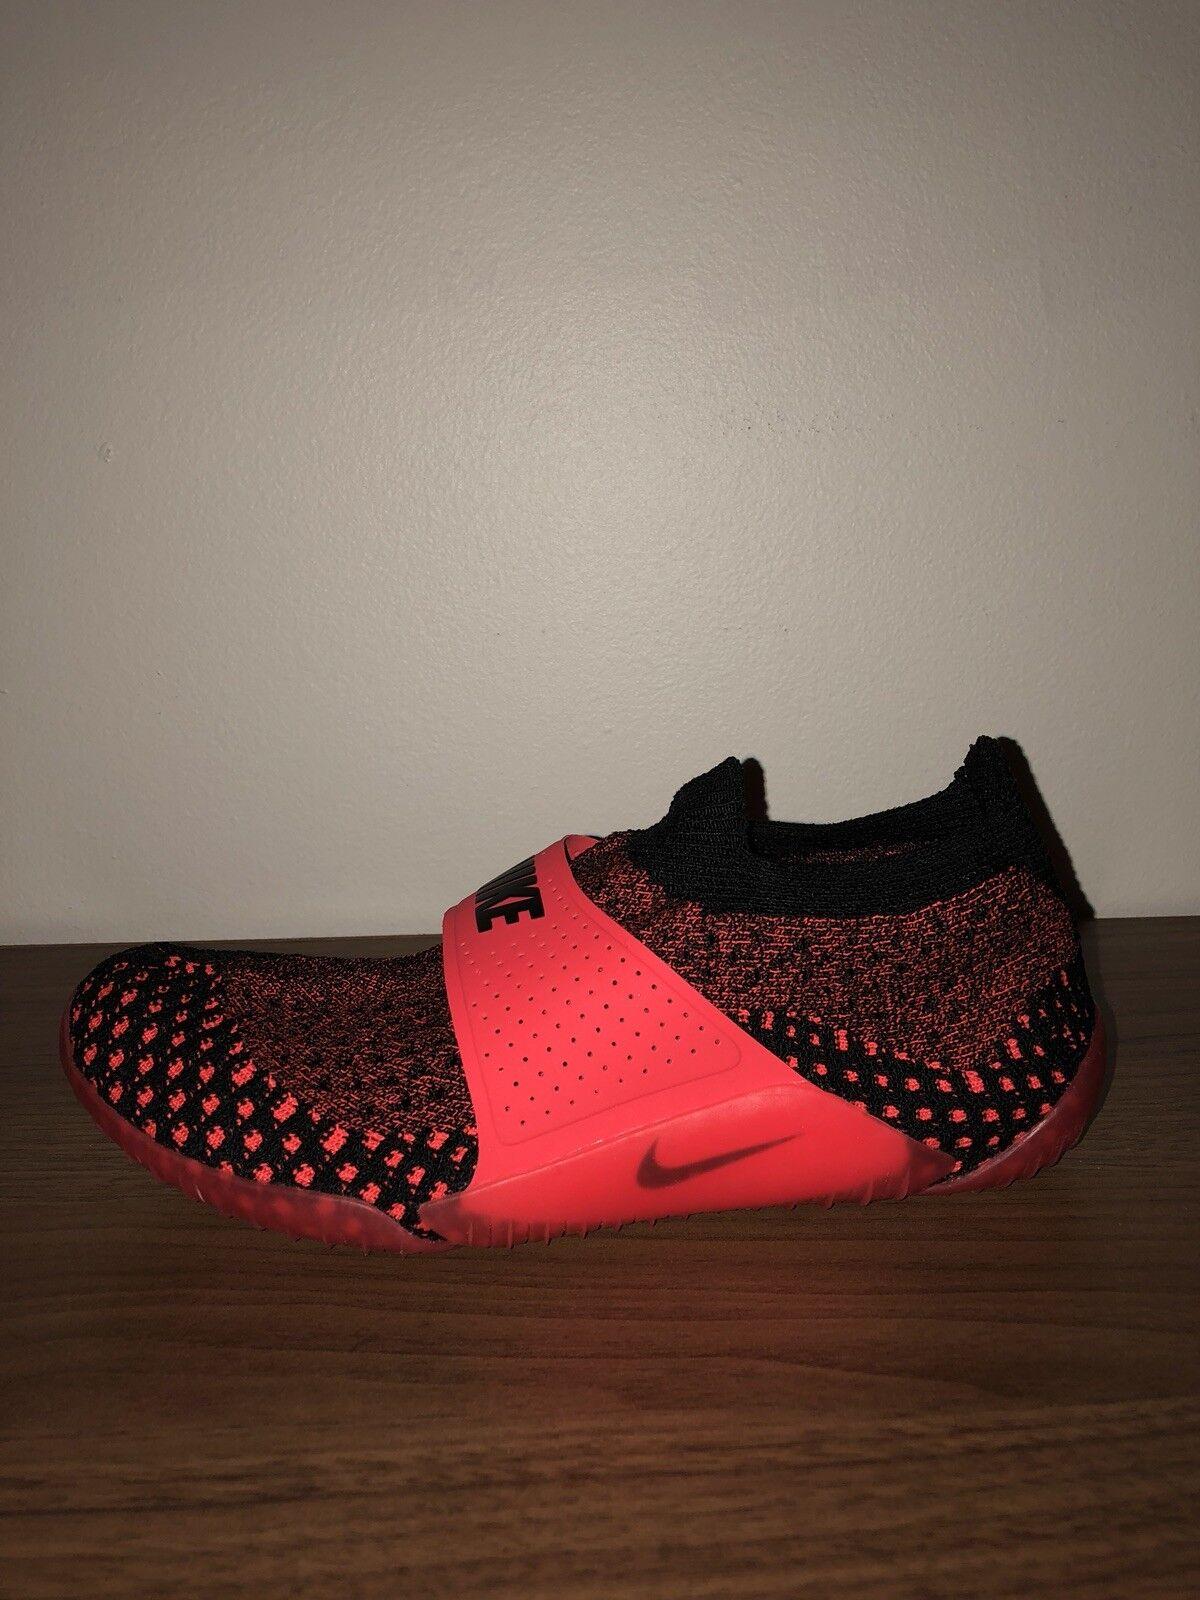 NikeLab City Knife 3 Flyknit Black/Bright Crimson 896284-002 Women's Size 7